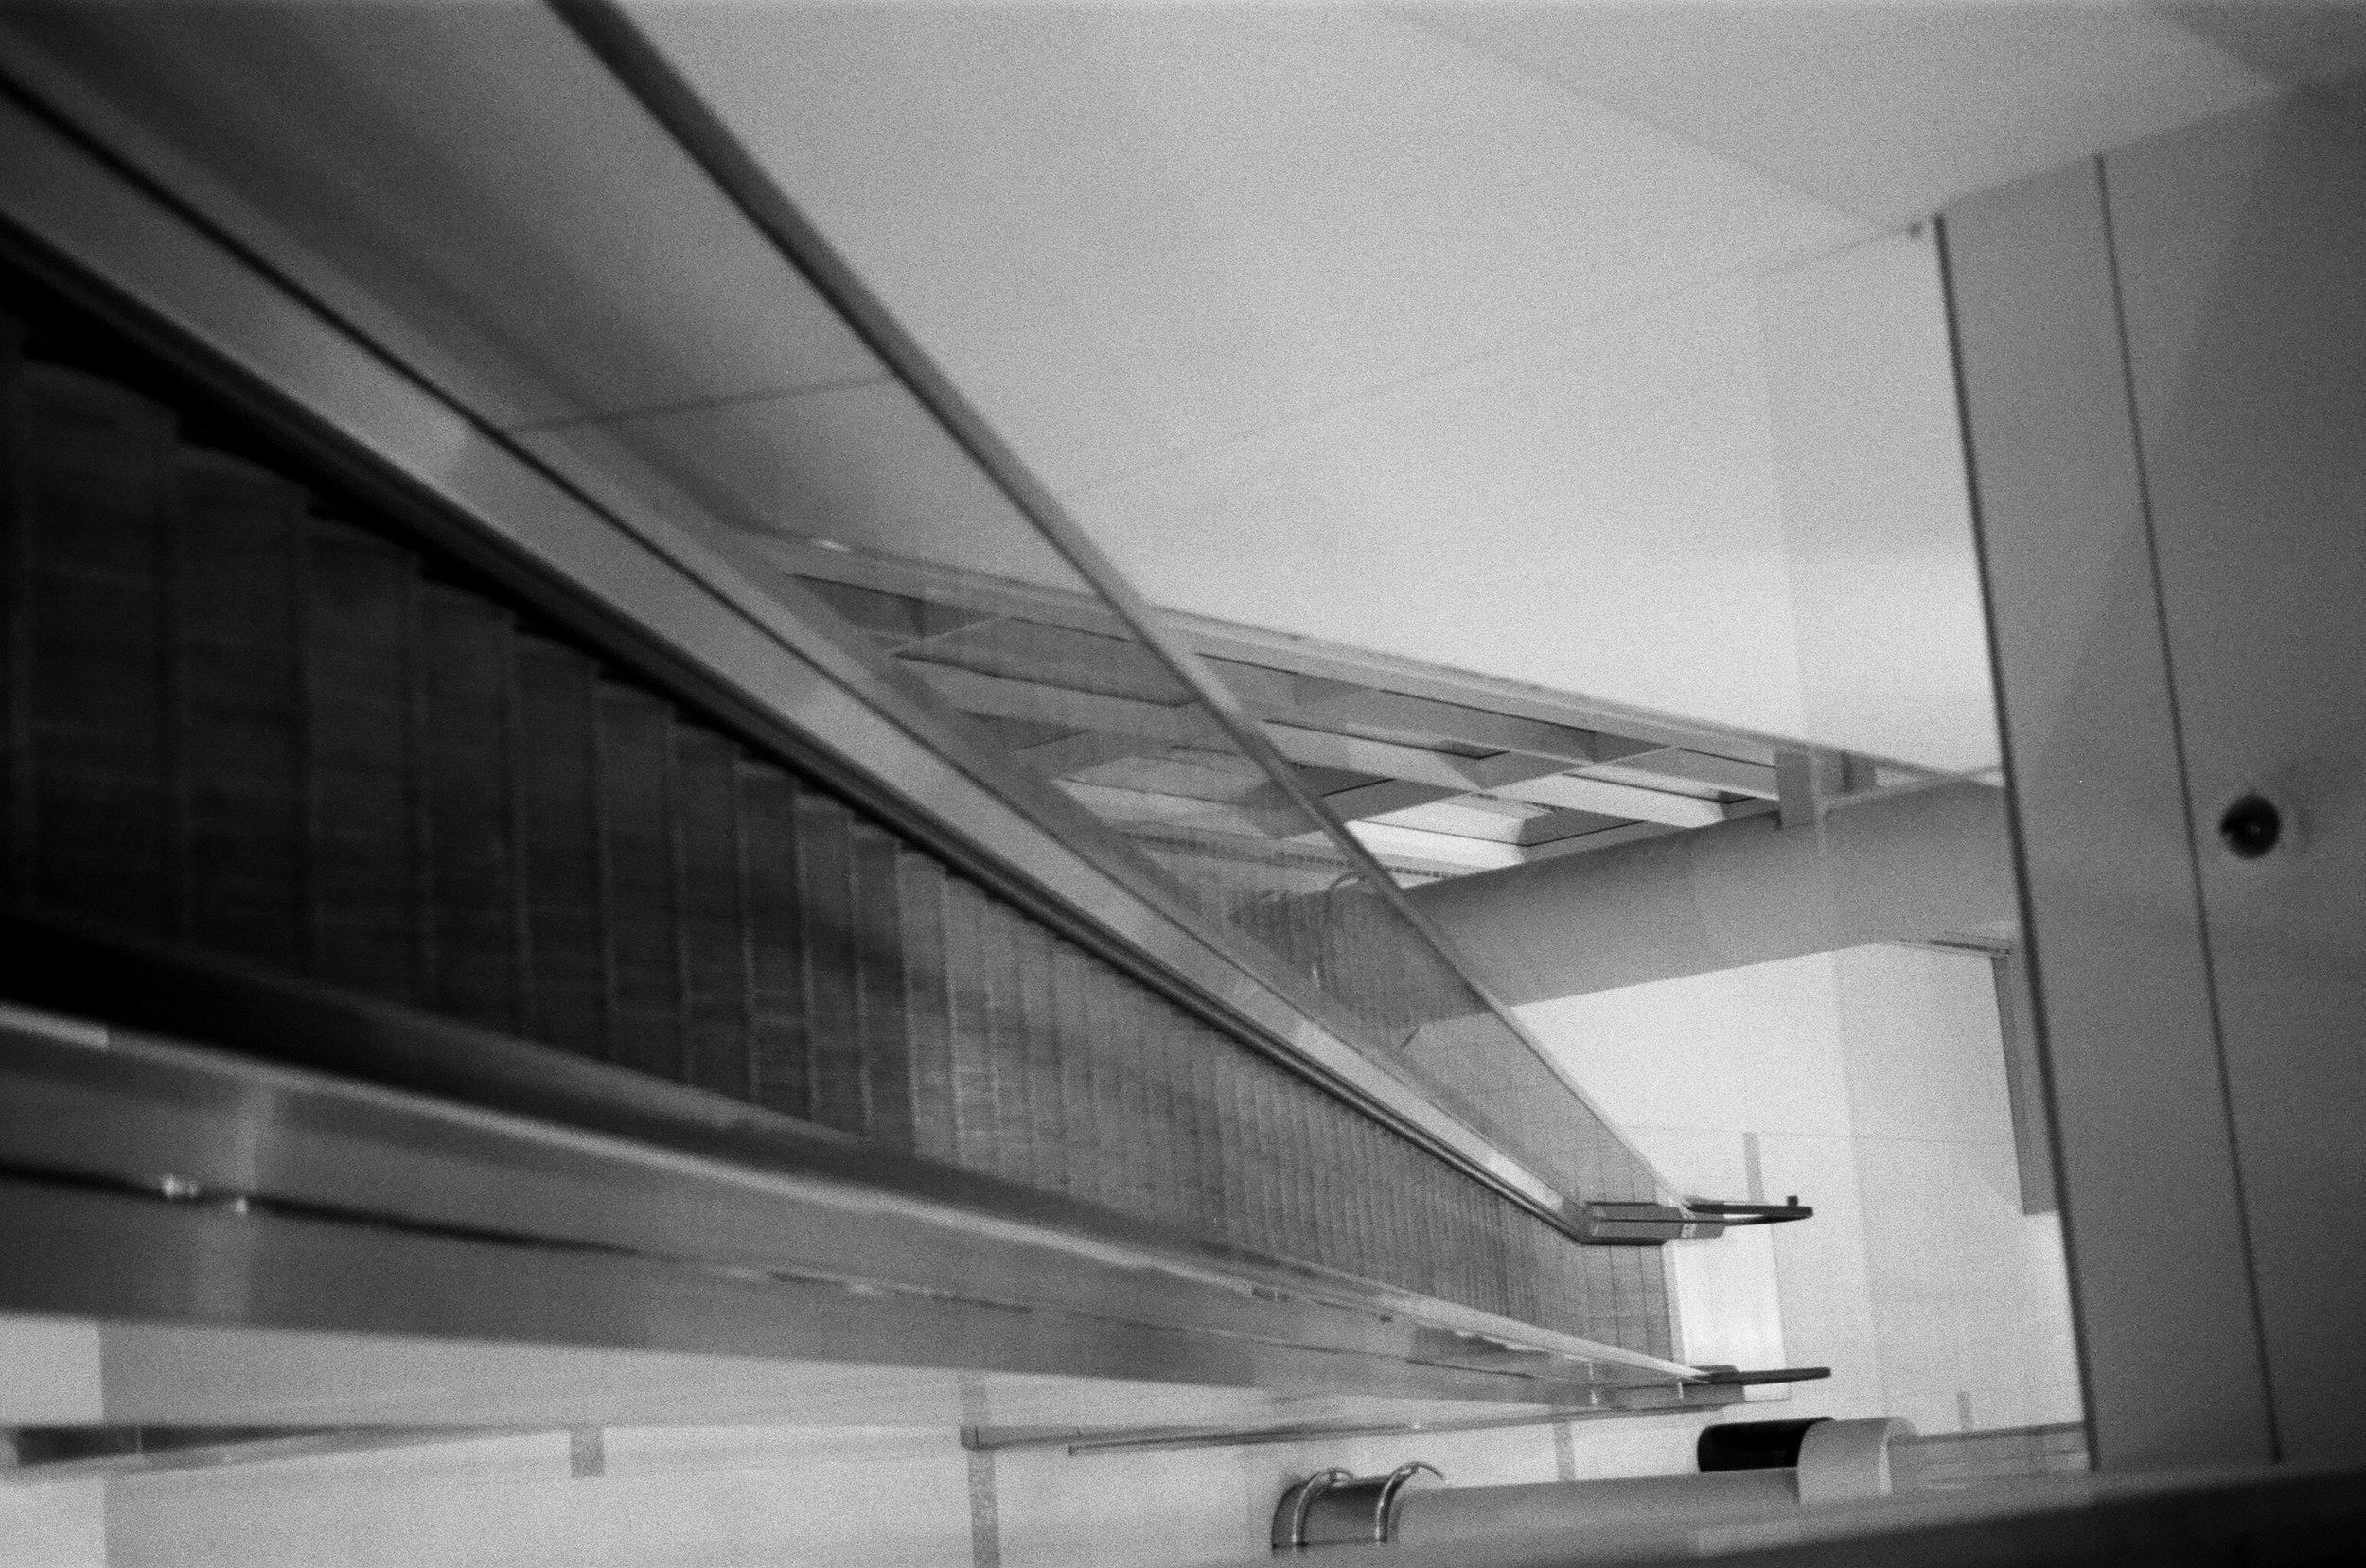 escalator2.jpg